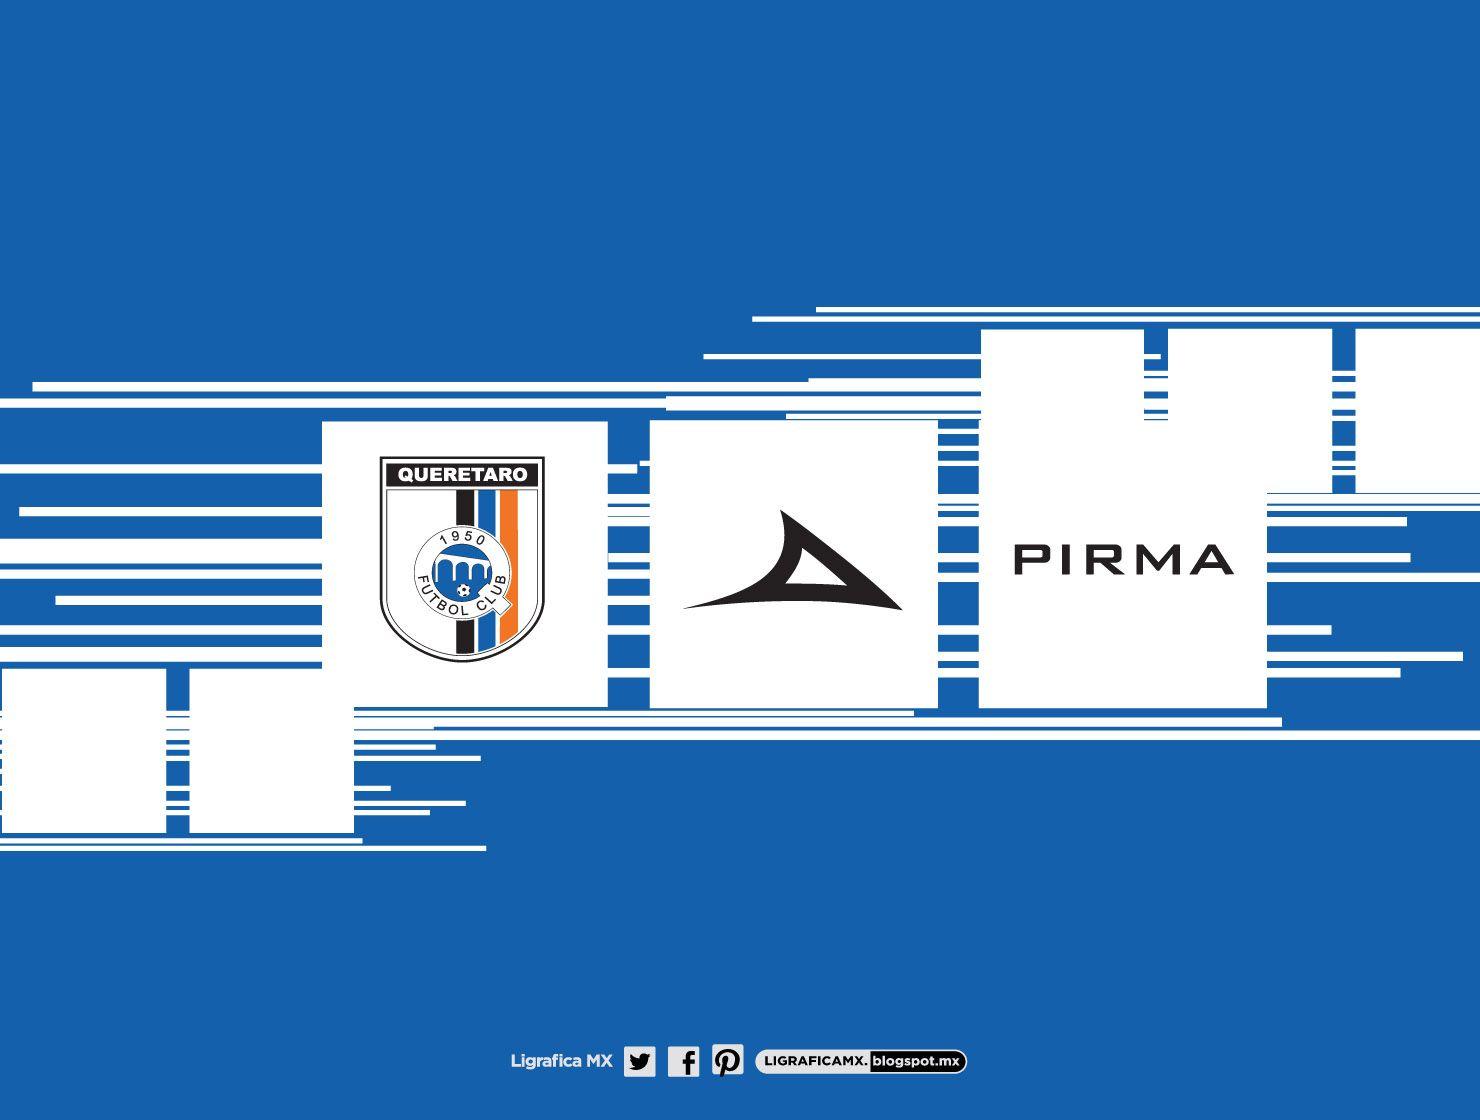 #Wallpaper Mod15092013CTG(2) #LigraficaMX • #Querétaro